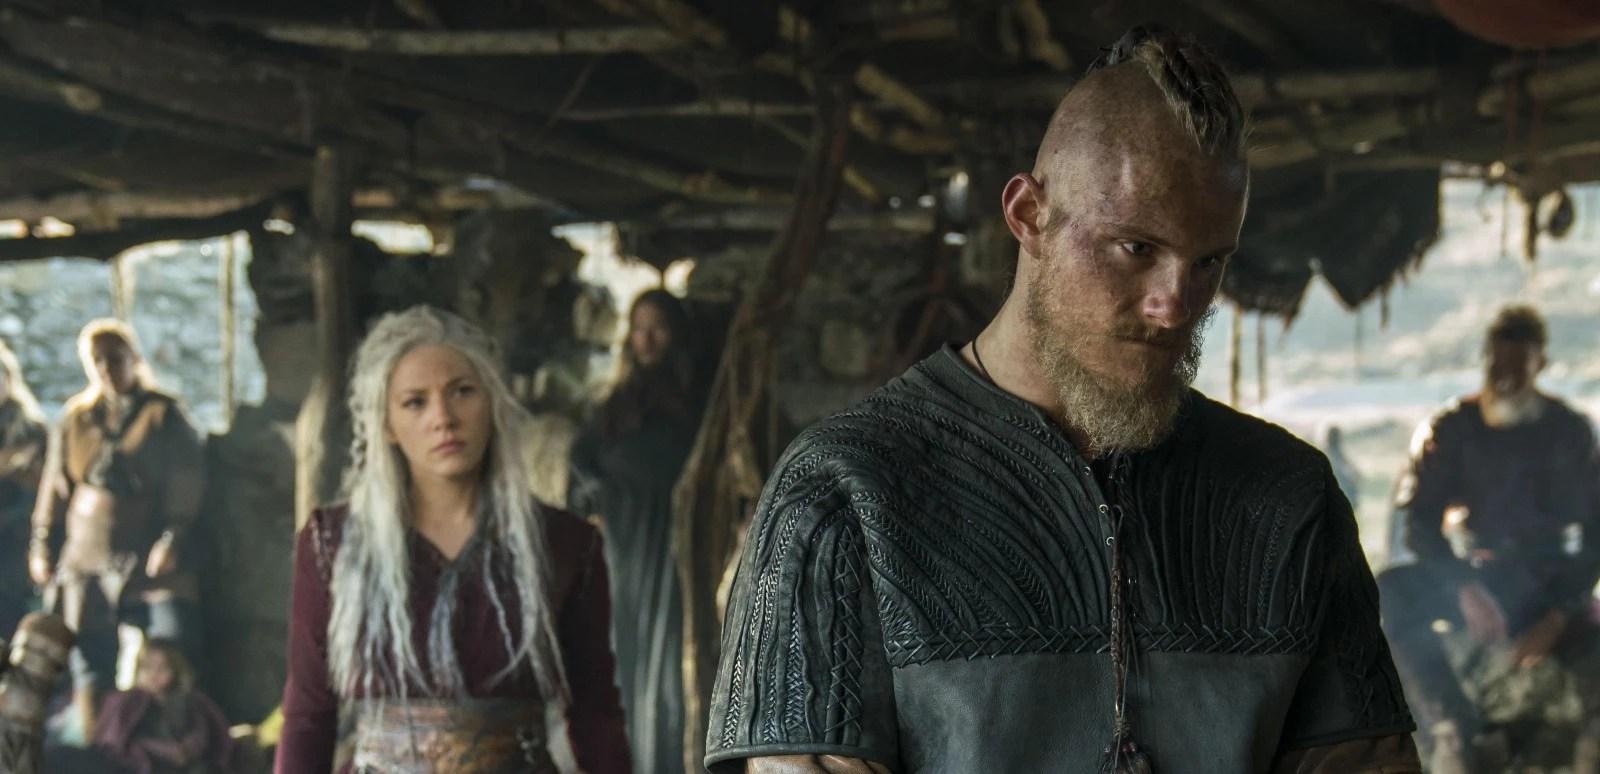 Regardez toutes les saisons en streaming français vf ou vostfr. Vikings Saison 5 Episode 7 Streaming Vostfr